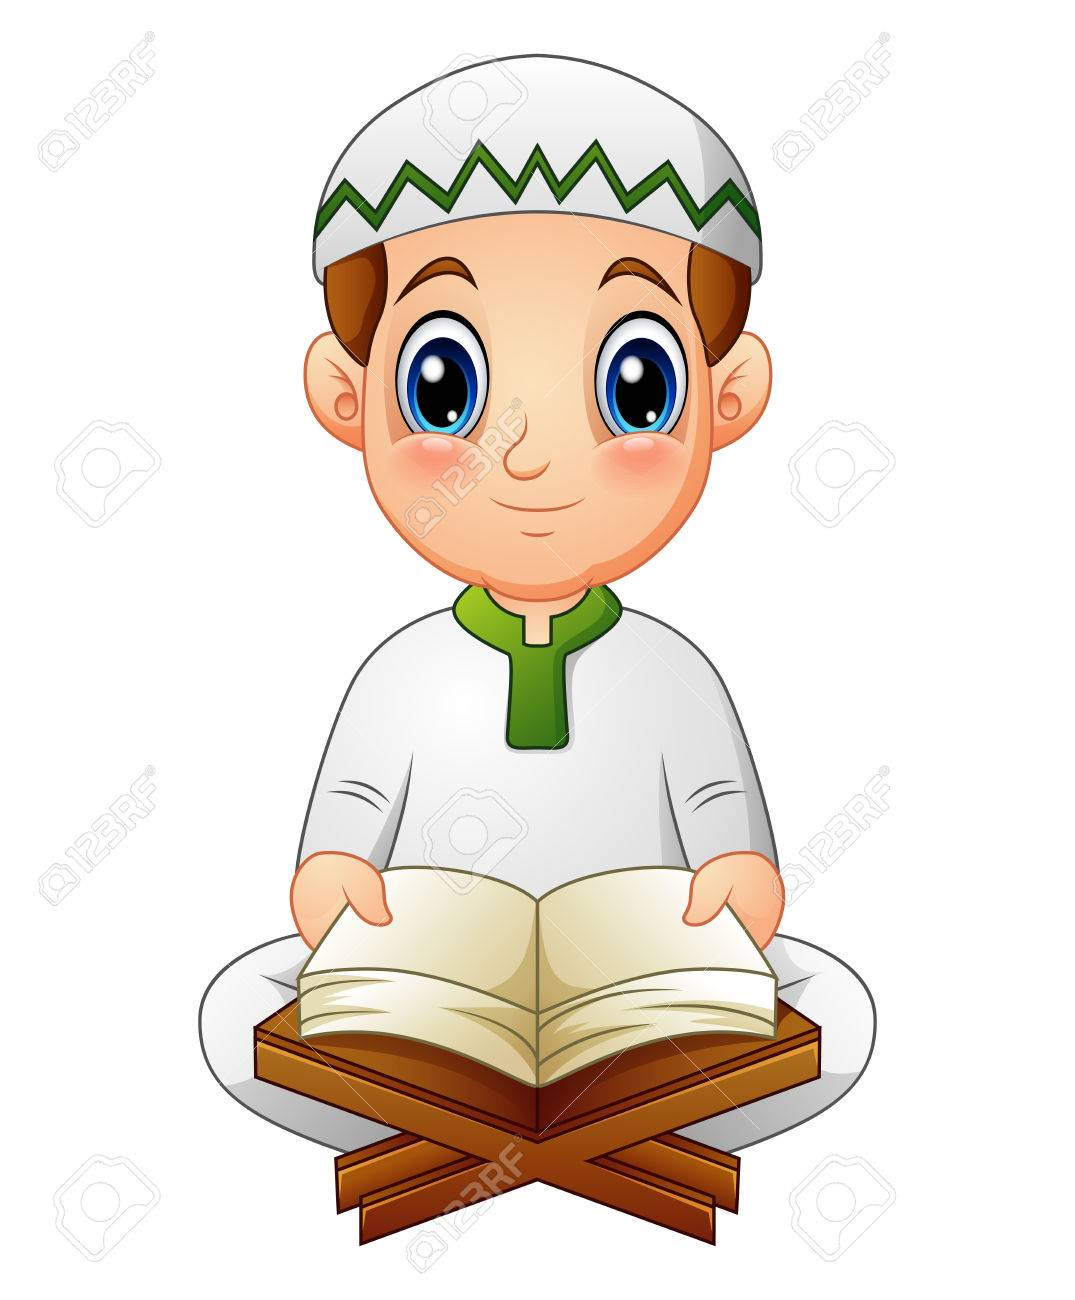 Reading Quran Clipart - Gambar Islami